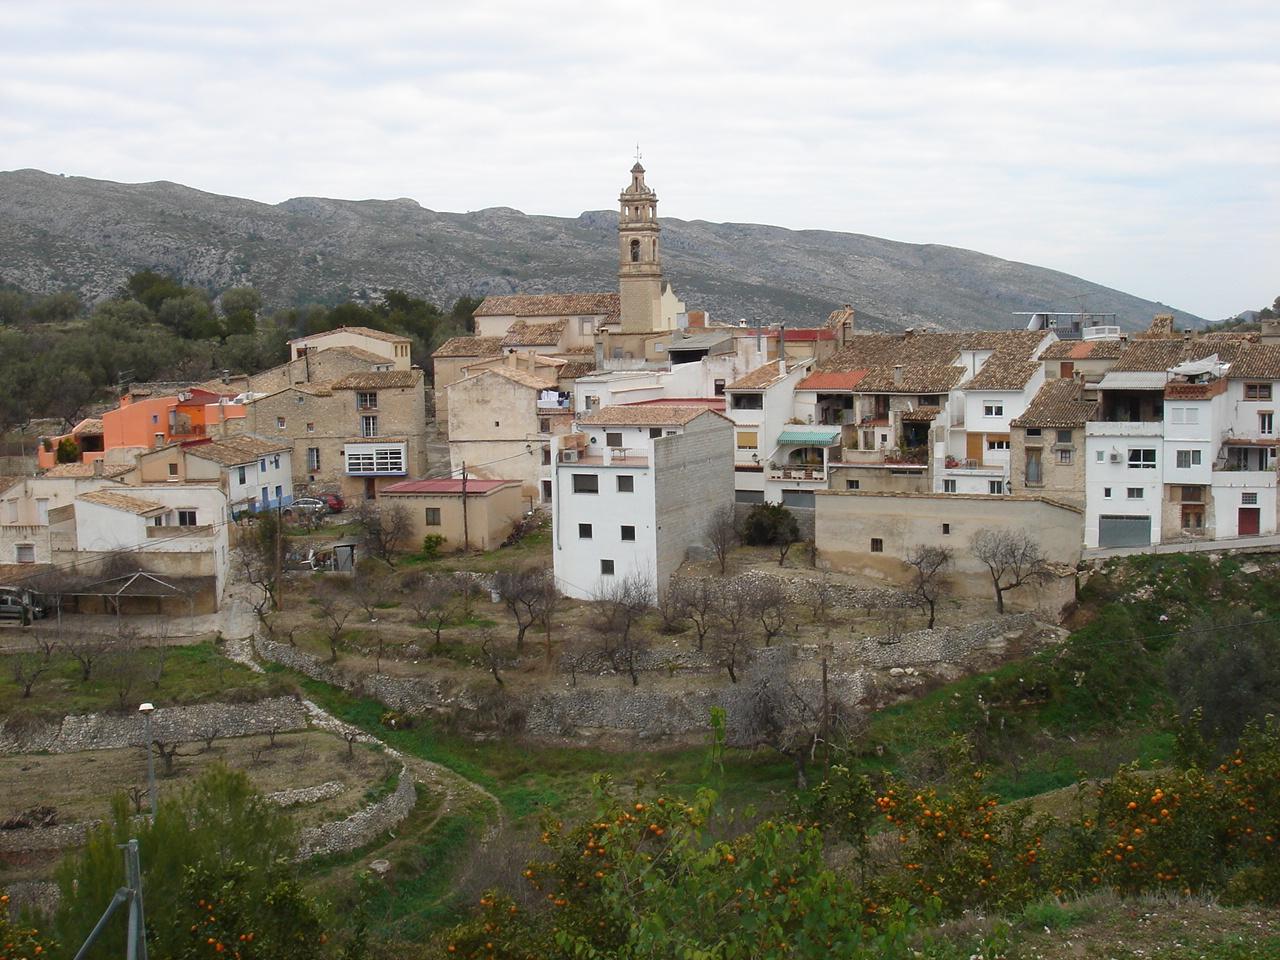 La Vall de Gallinera